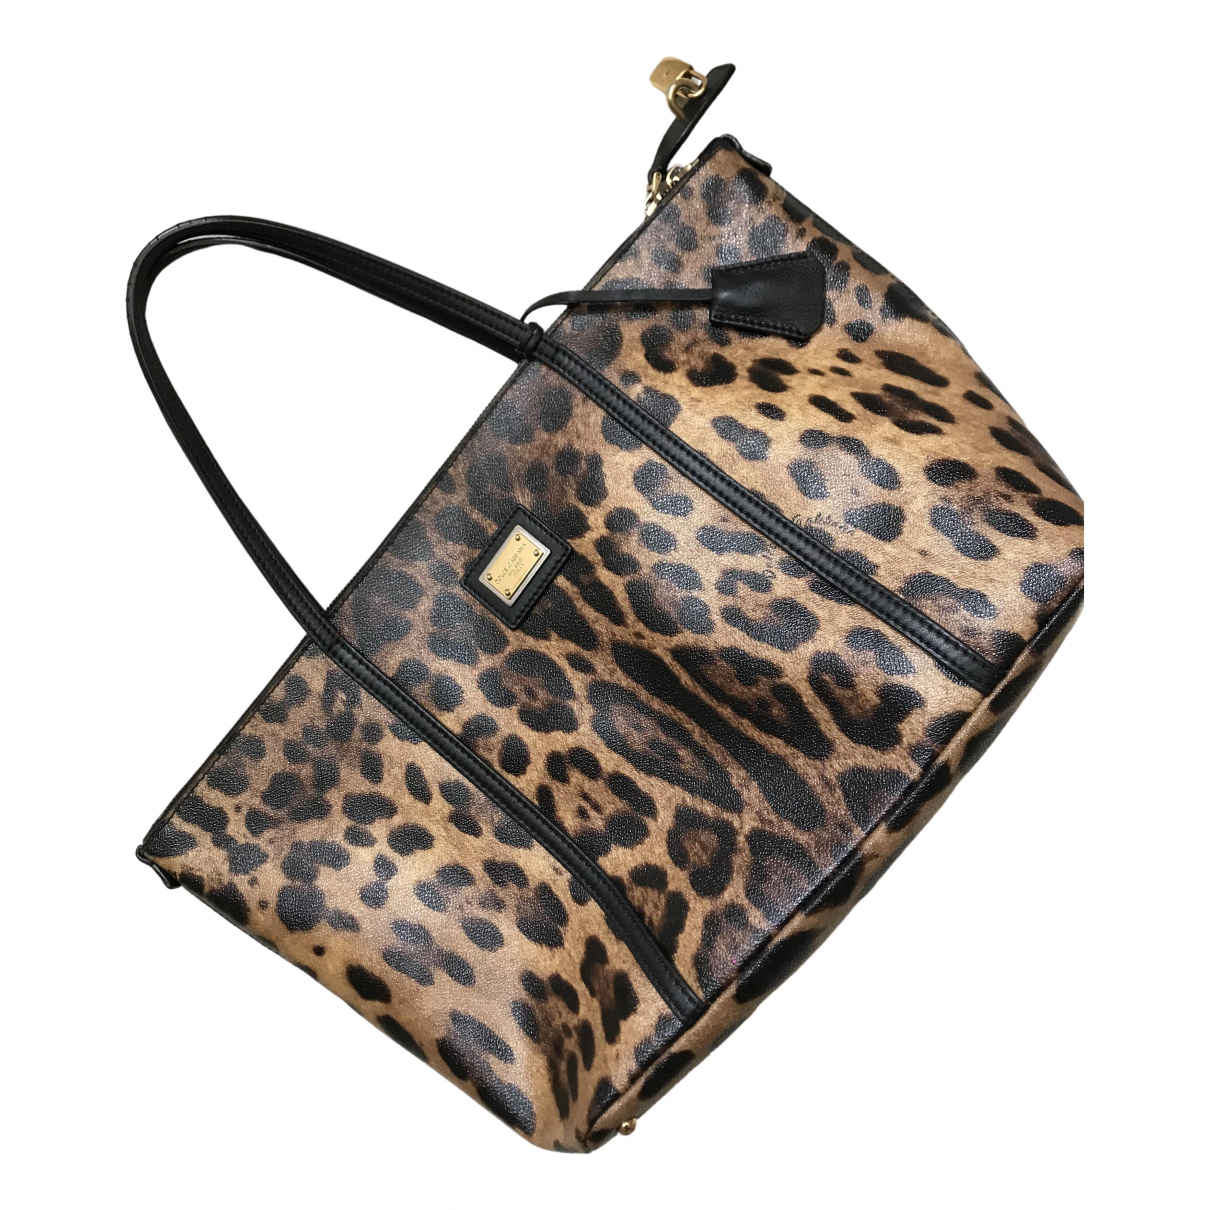 Dolce & Gabbana N Brown Leather handbag for Women N